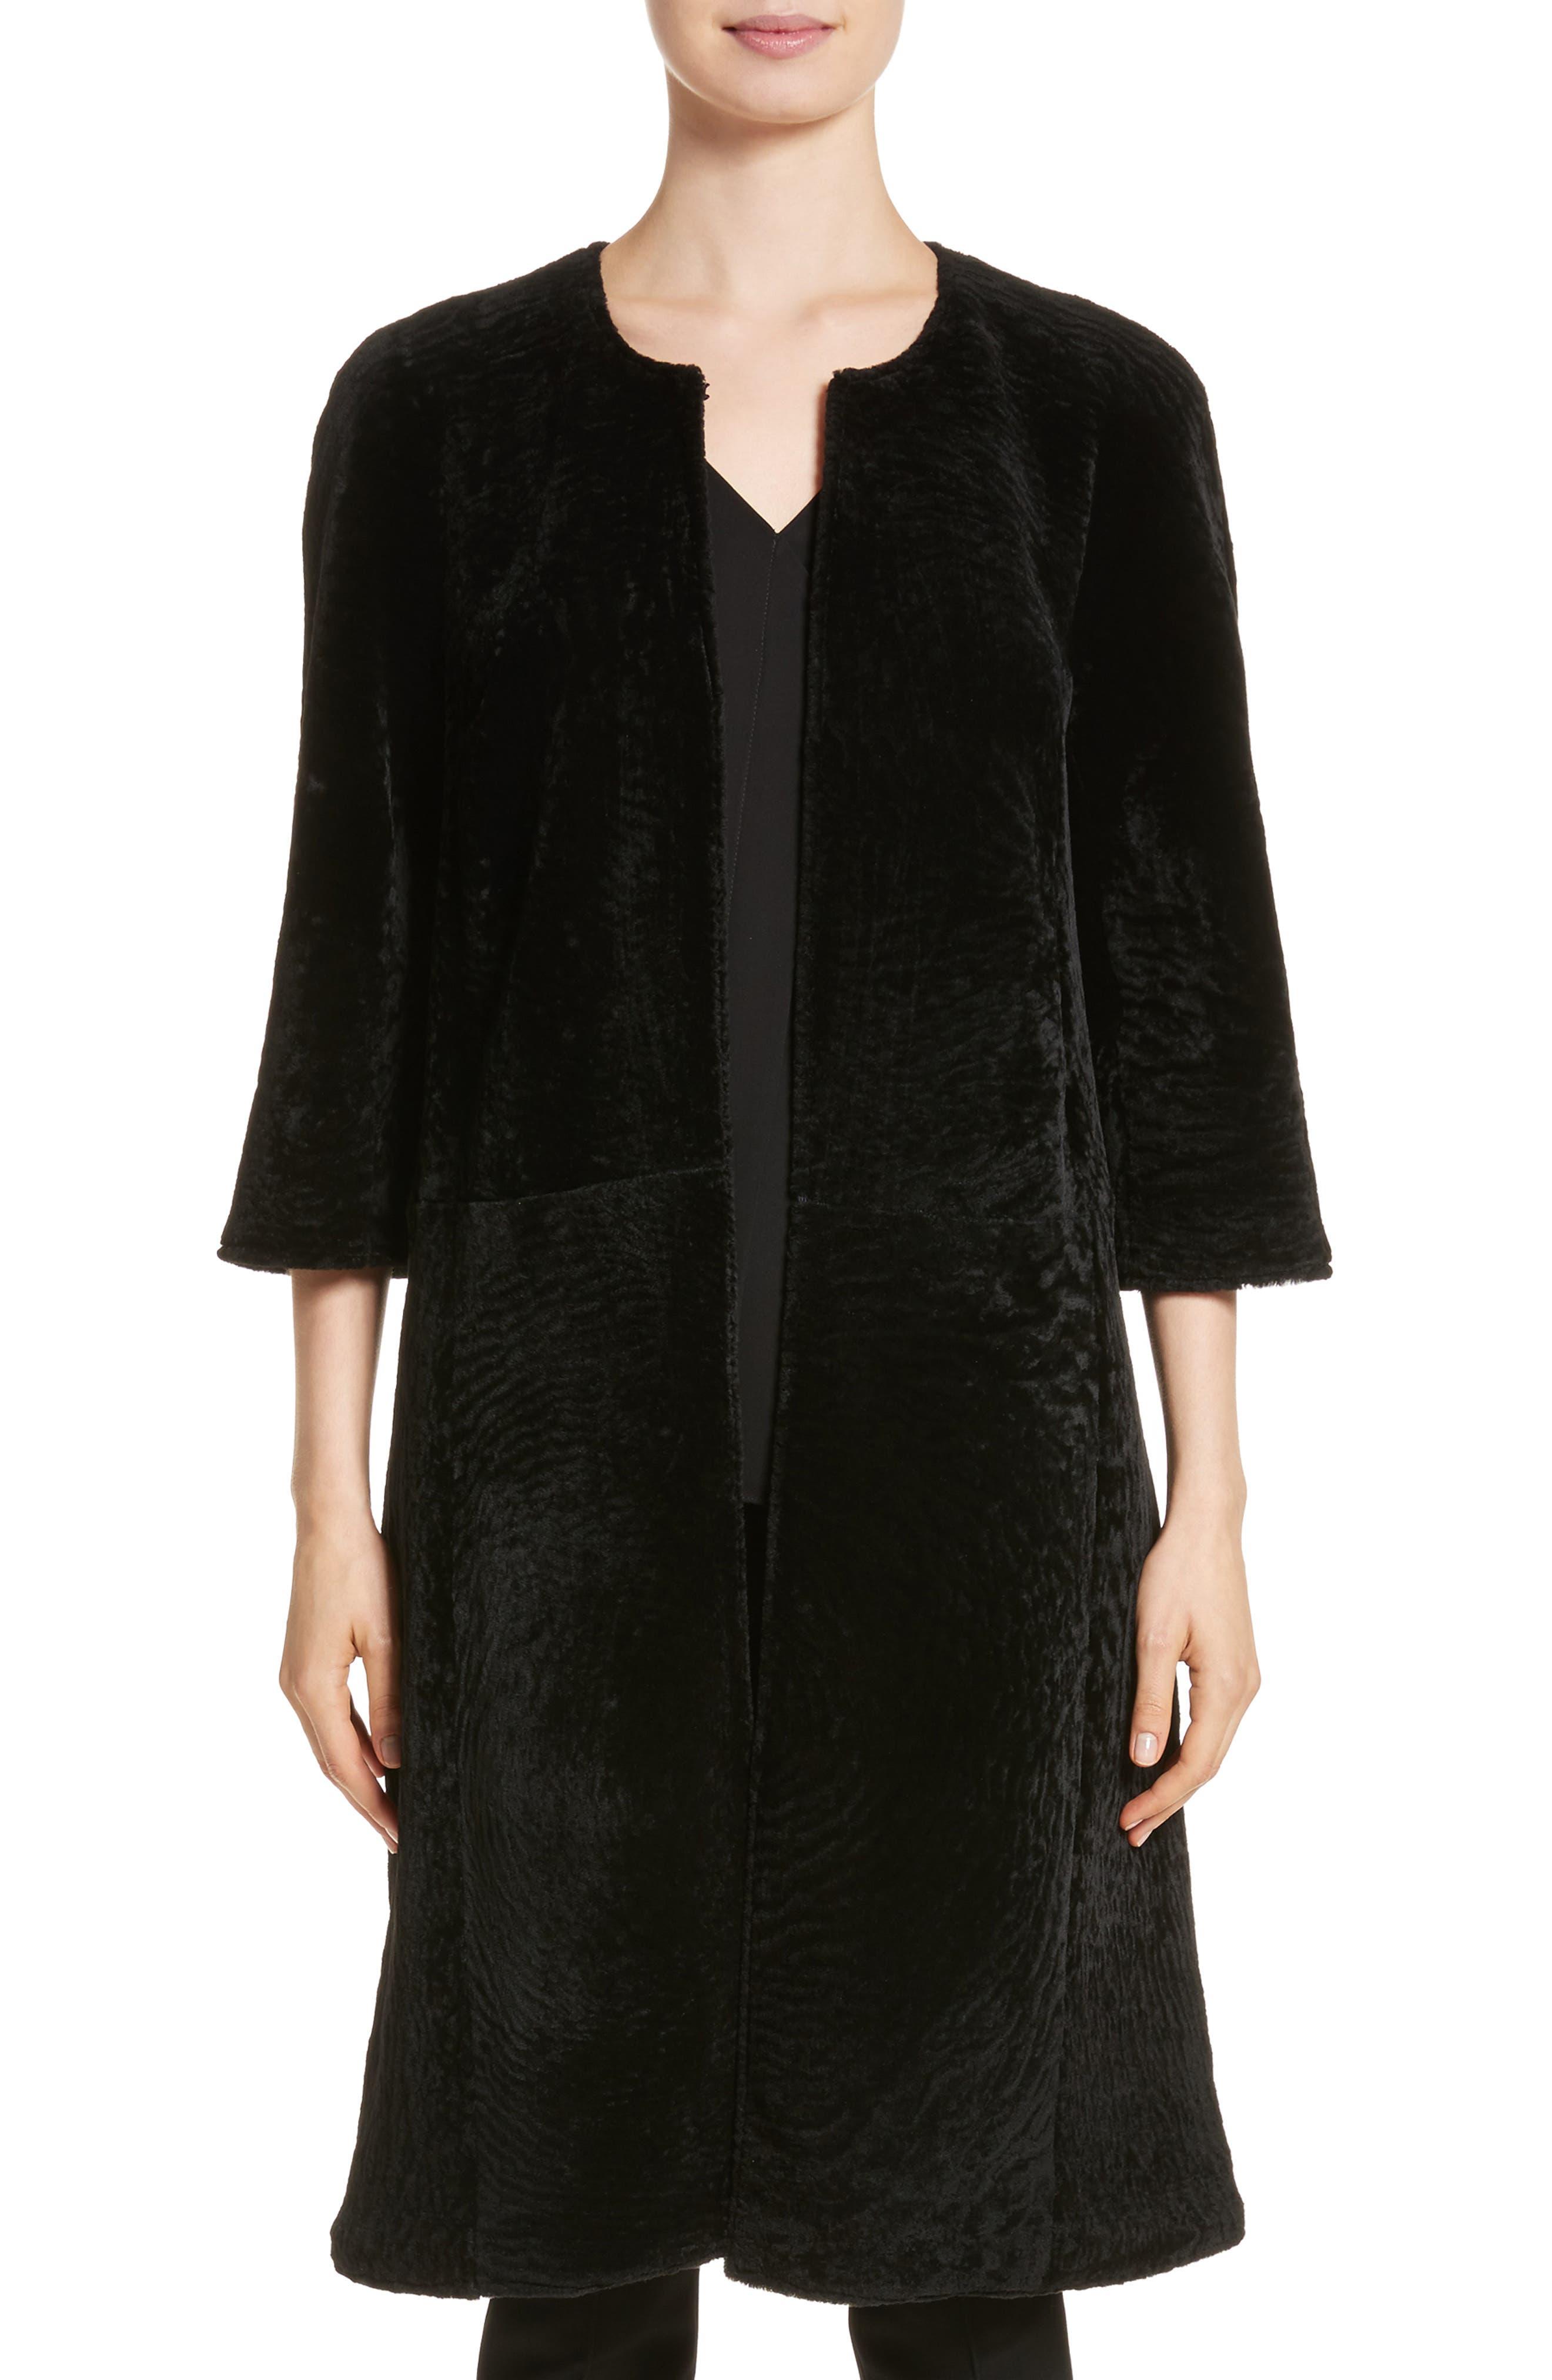 Genuine Textured Lamb Fur Jacket,                         Main,                         color, Caviar